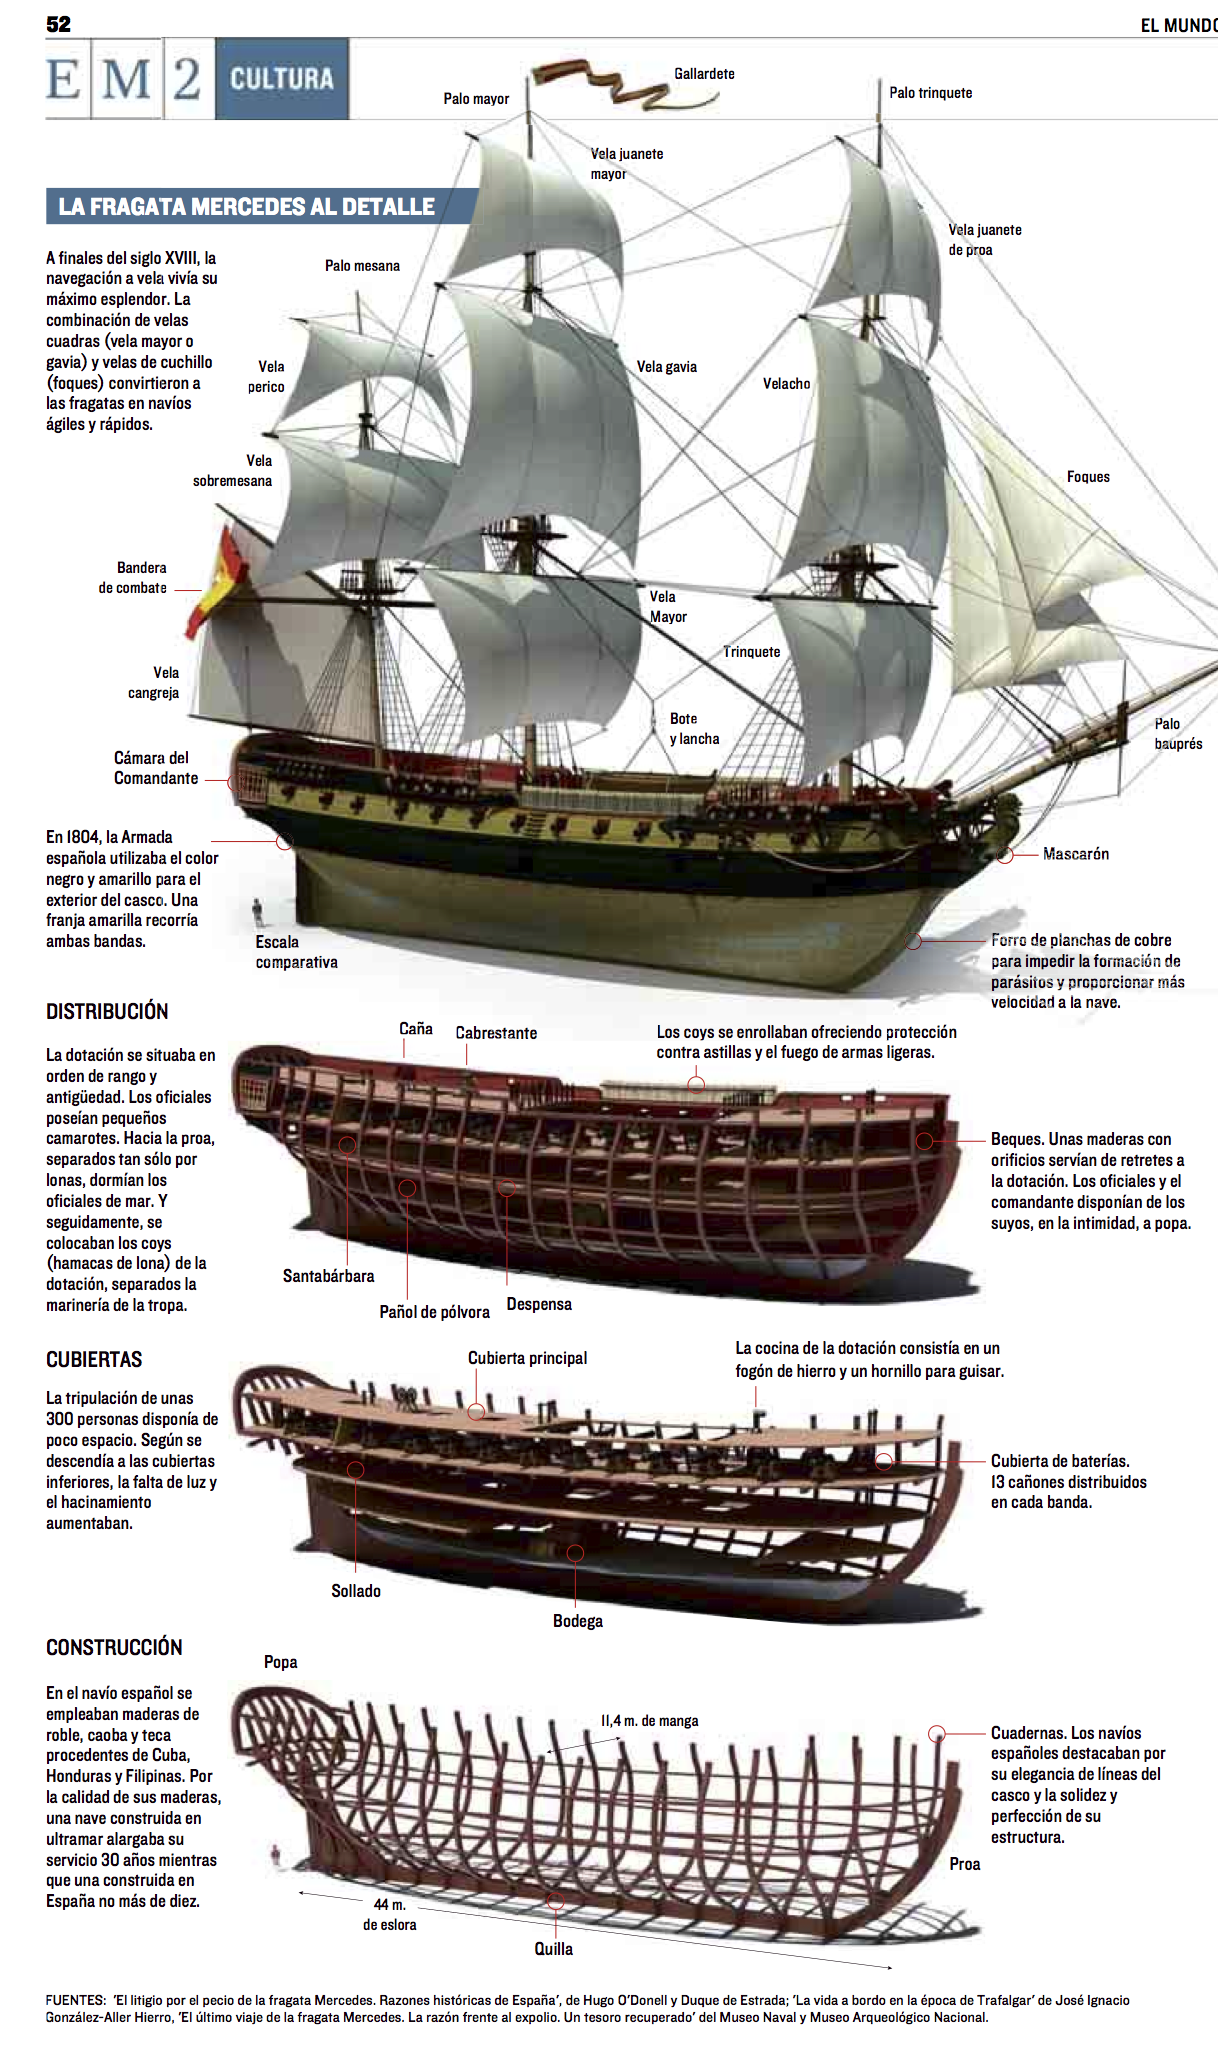 parts of a pirate ship diagram human digestive system unlabeled fragata merced el mundo sailing ships pinterest